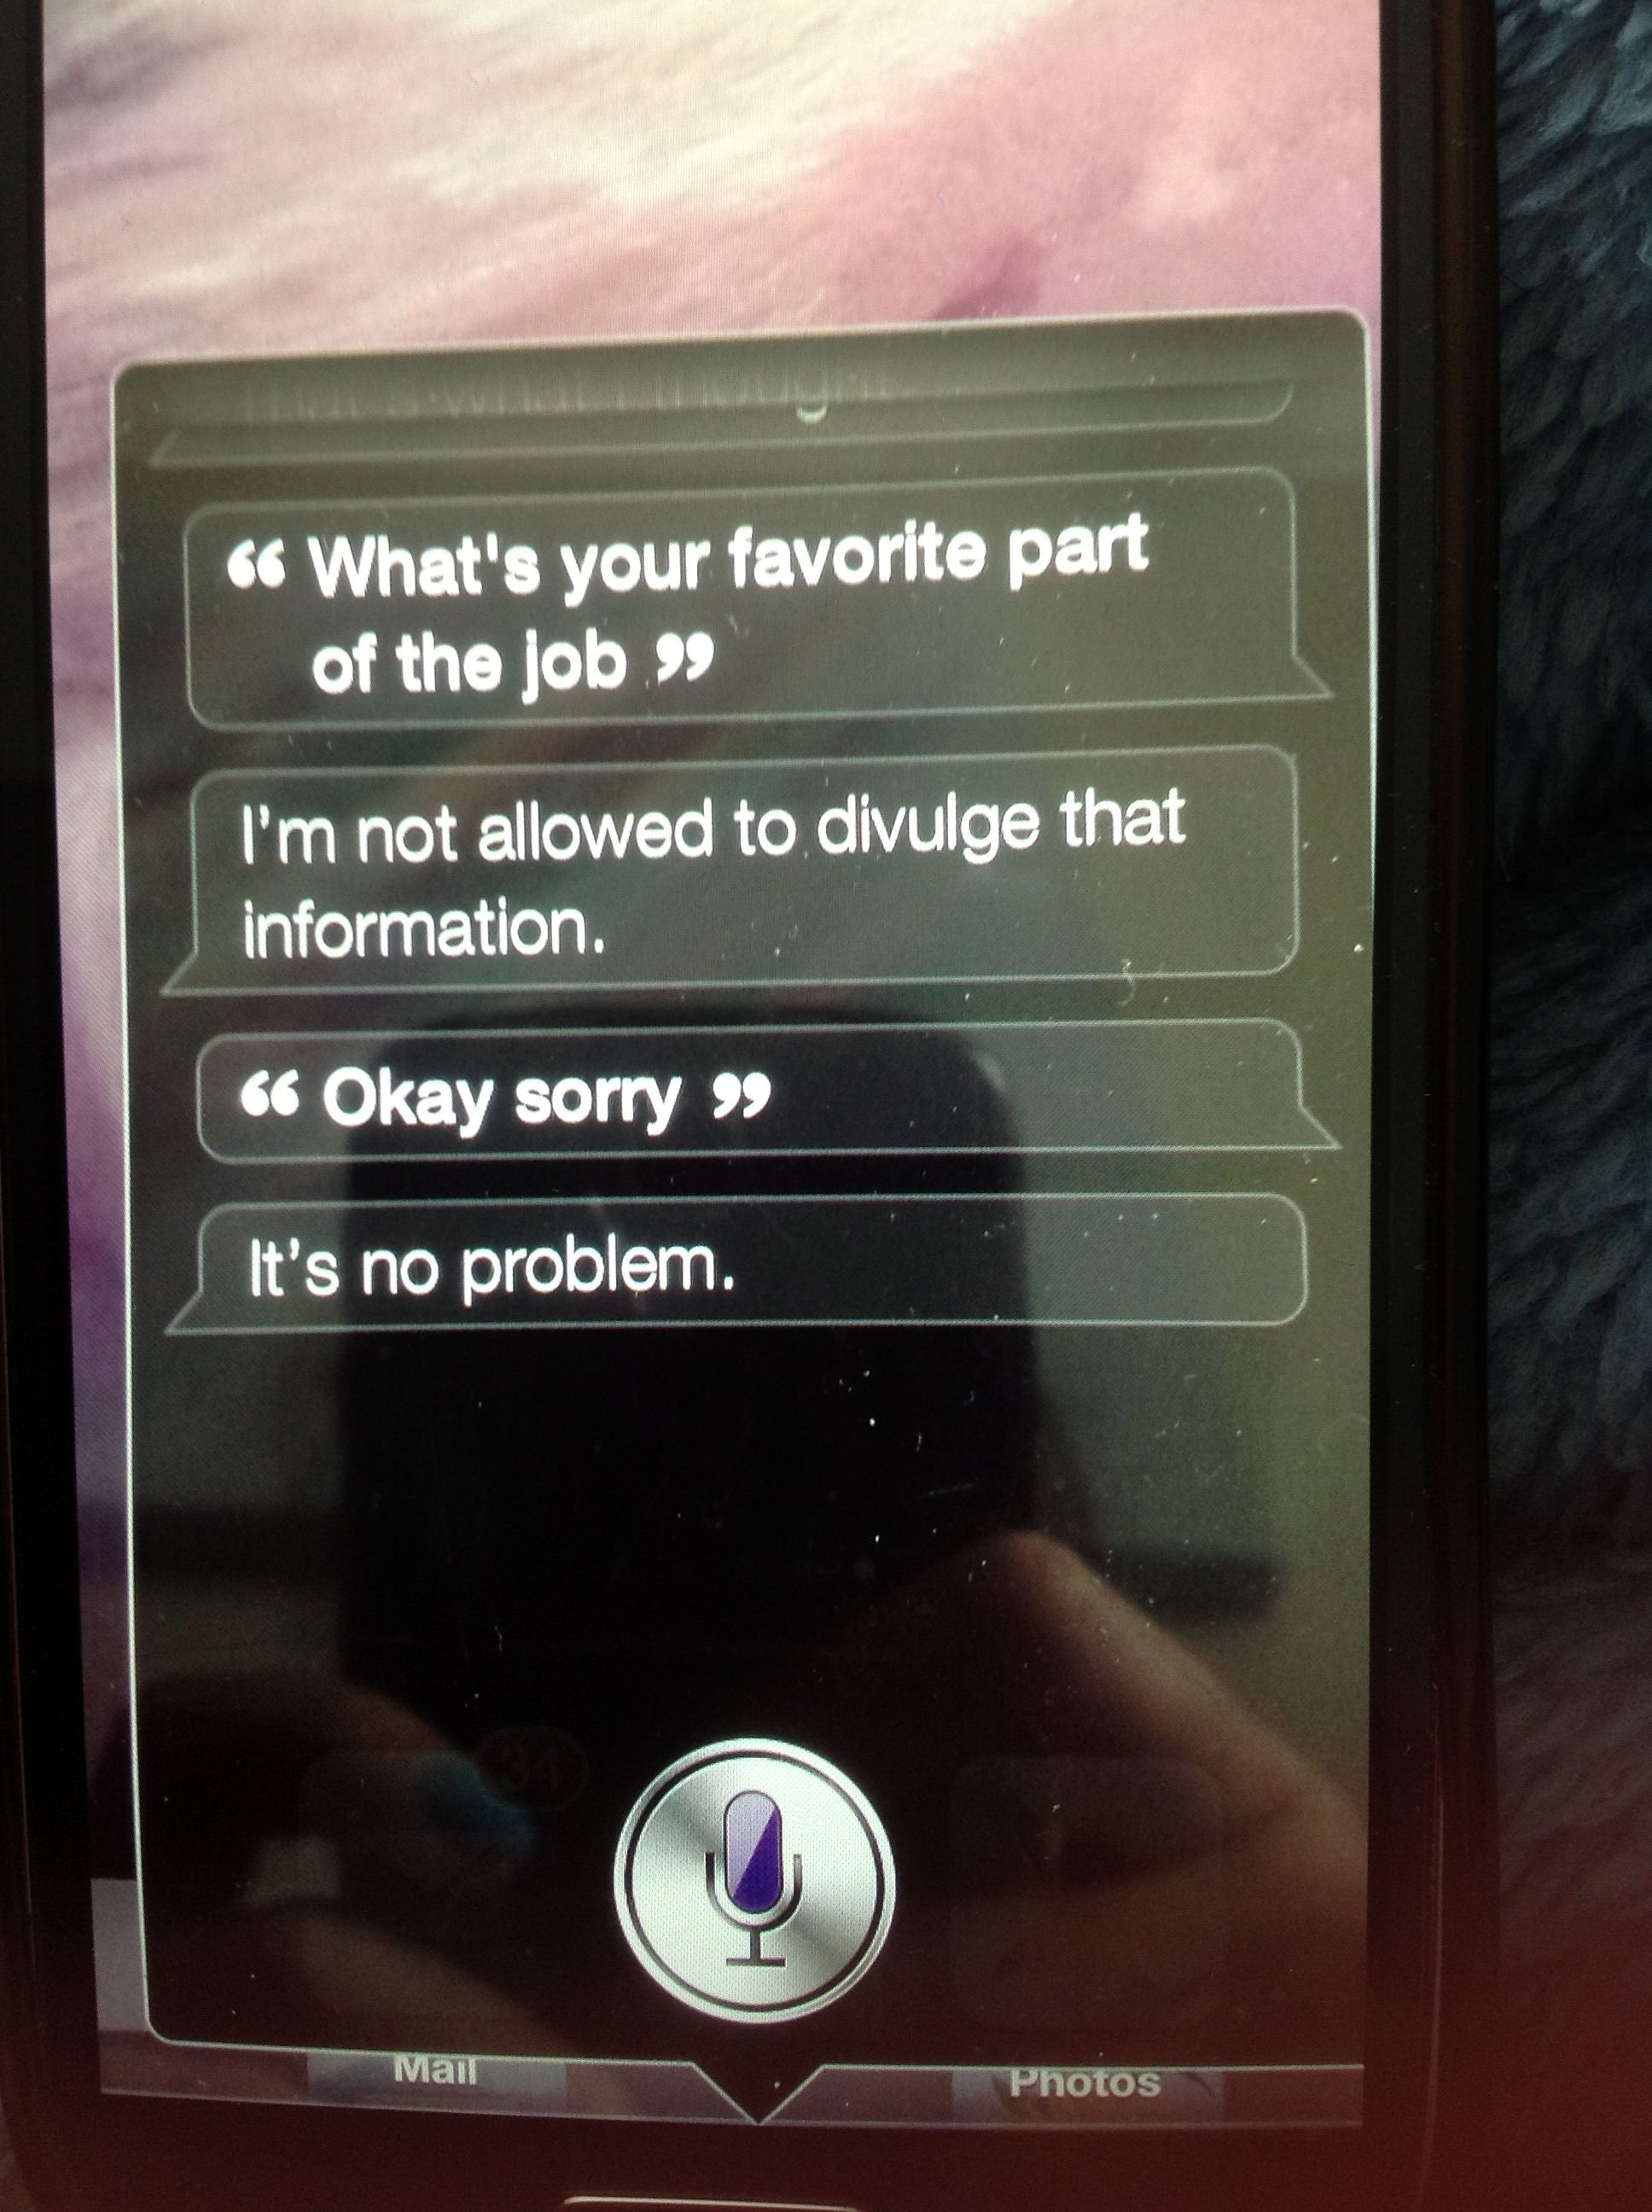 OMG, What is Siri hiding????